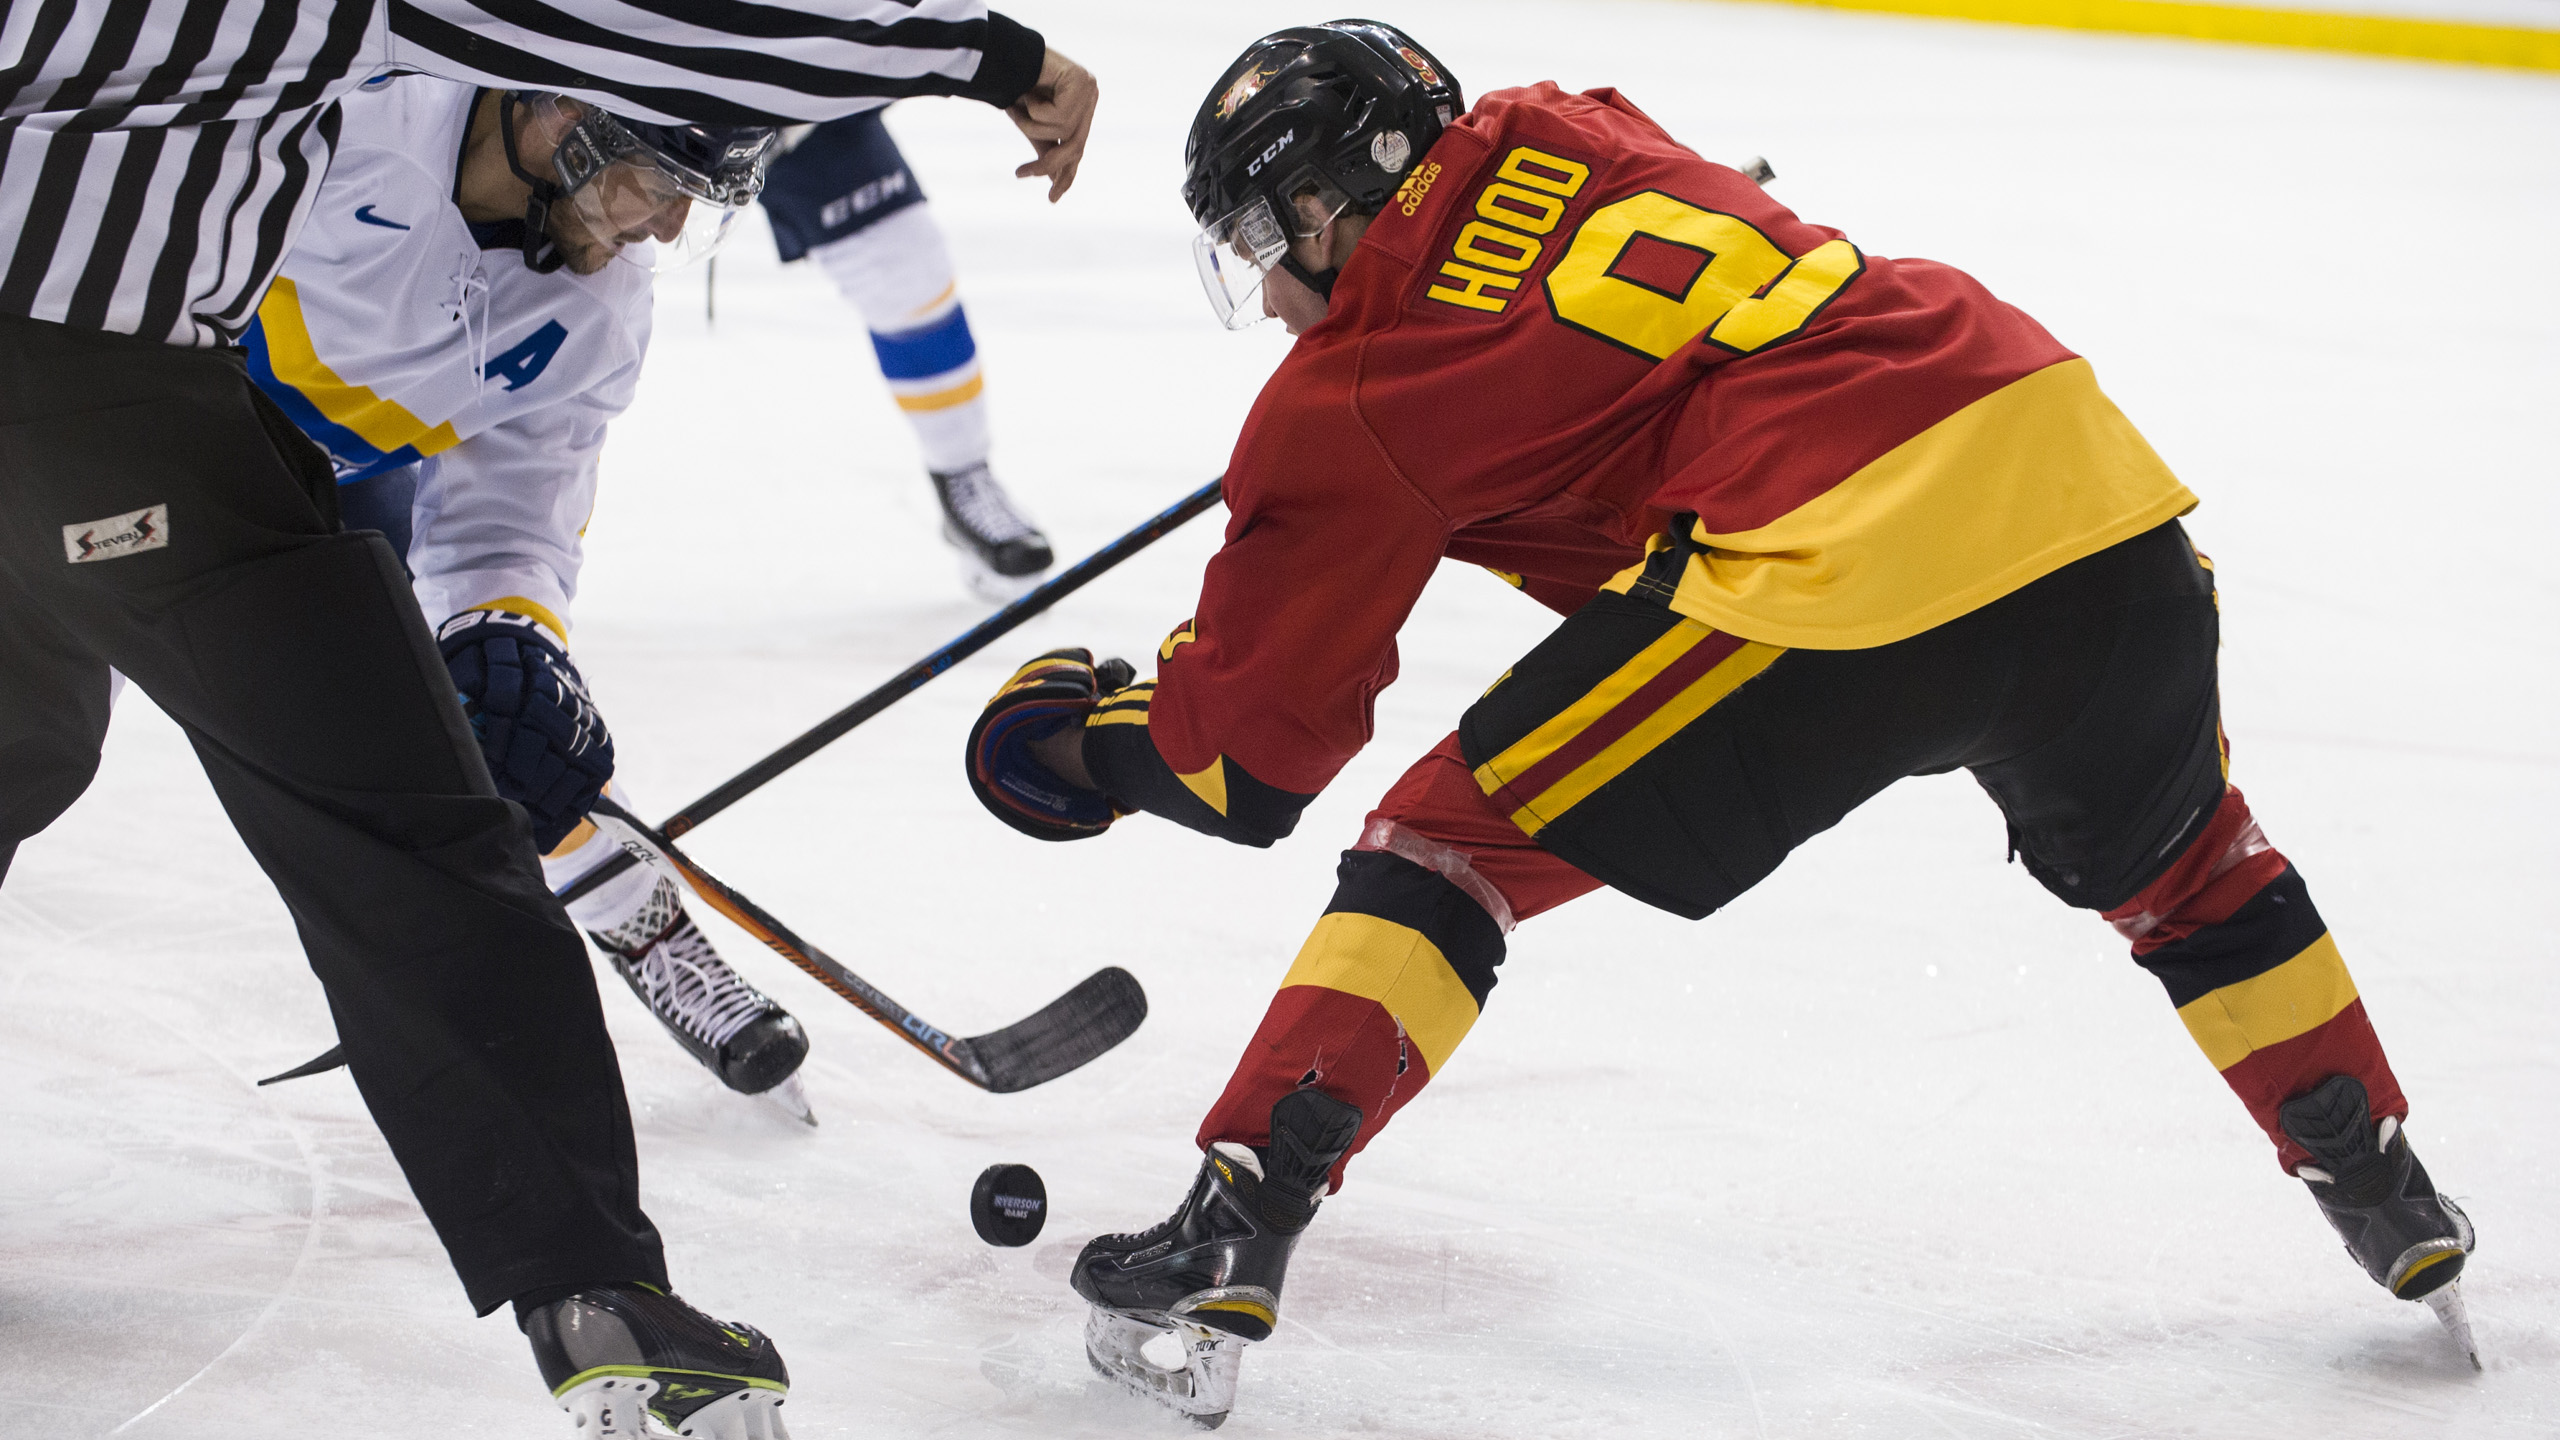 MensHockey8_Feb7_AndrejIvanov